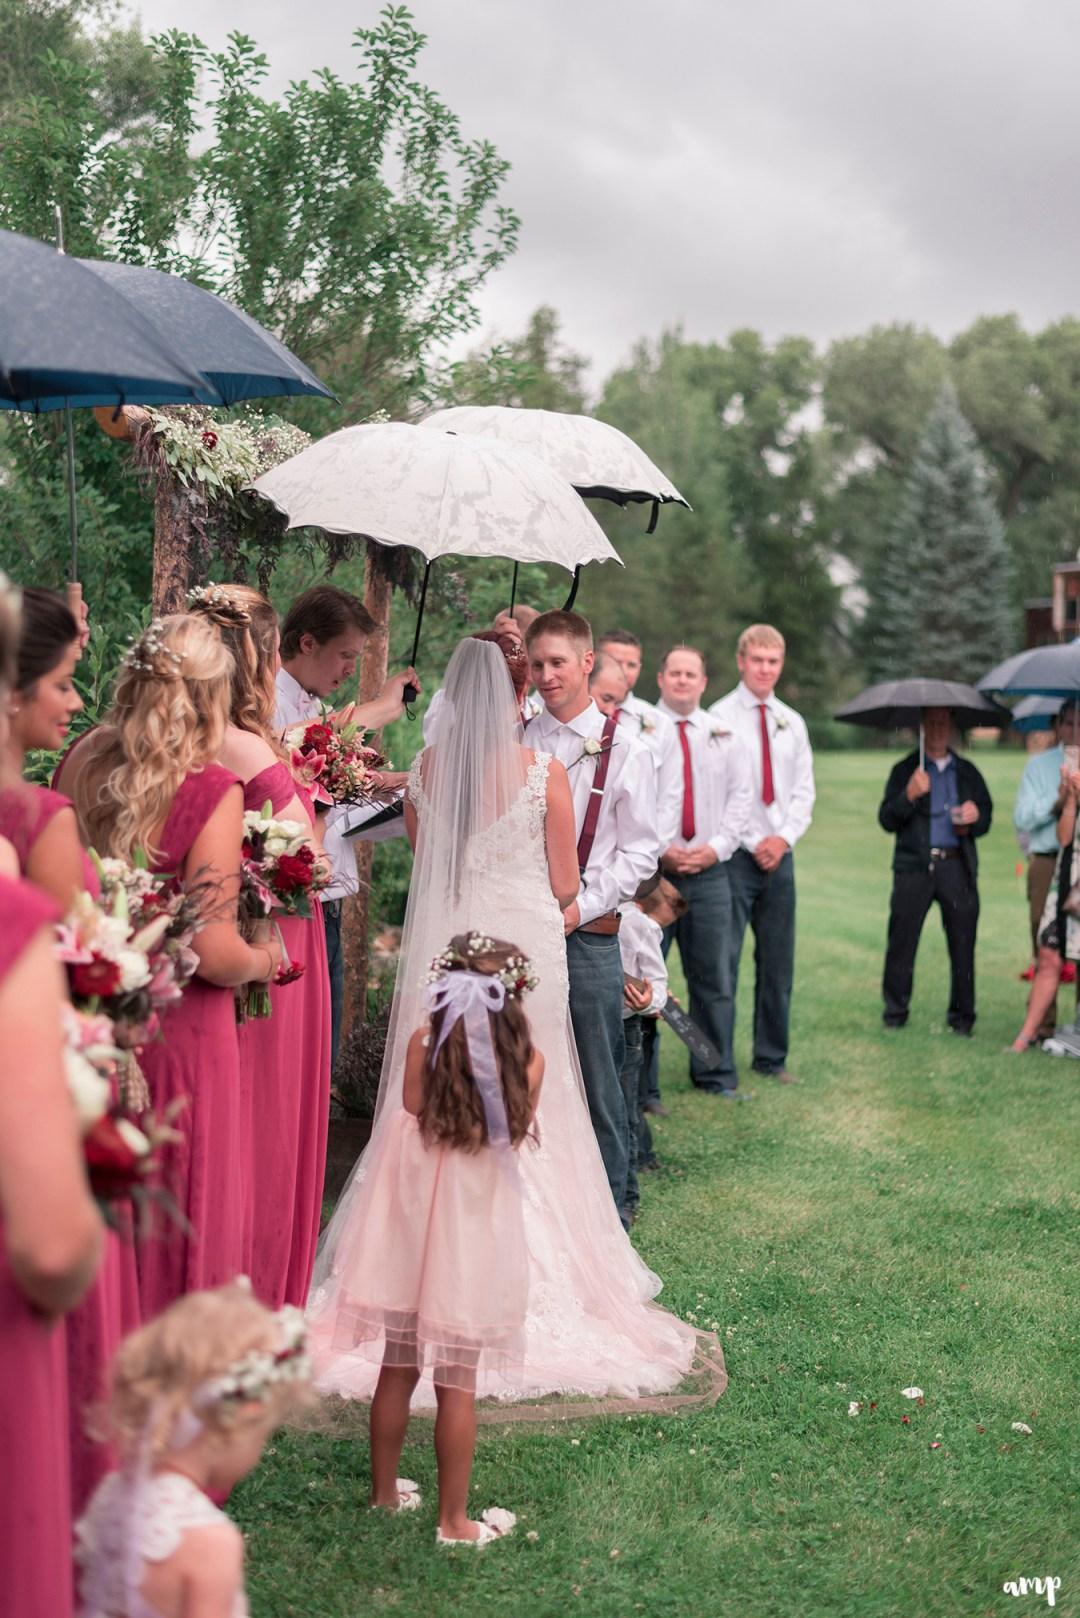 Rainy Gunnison Wedding along Ohio Creek   amanda.matilda.photography